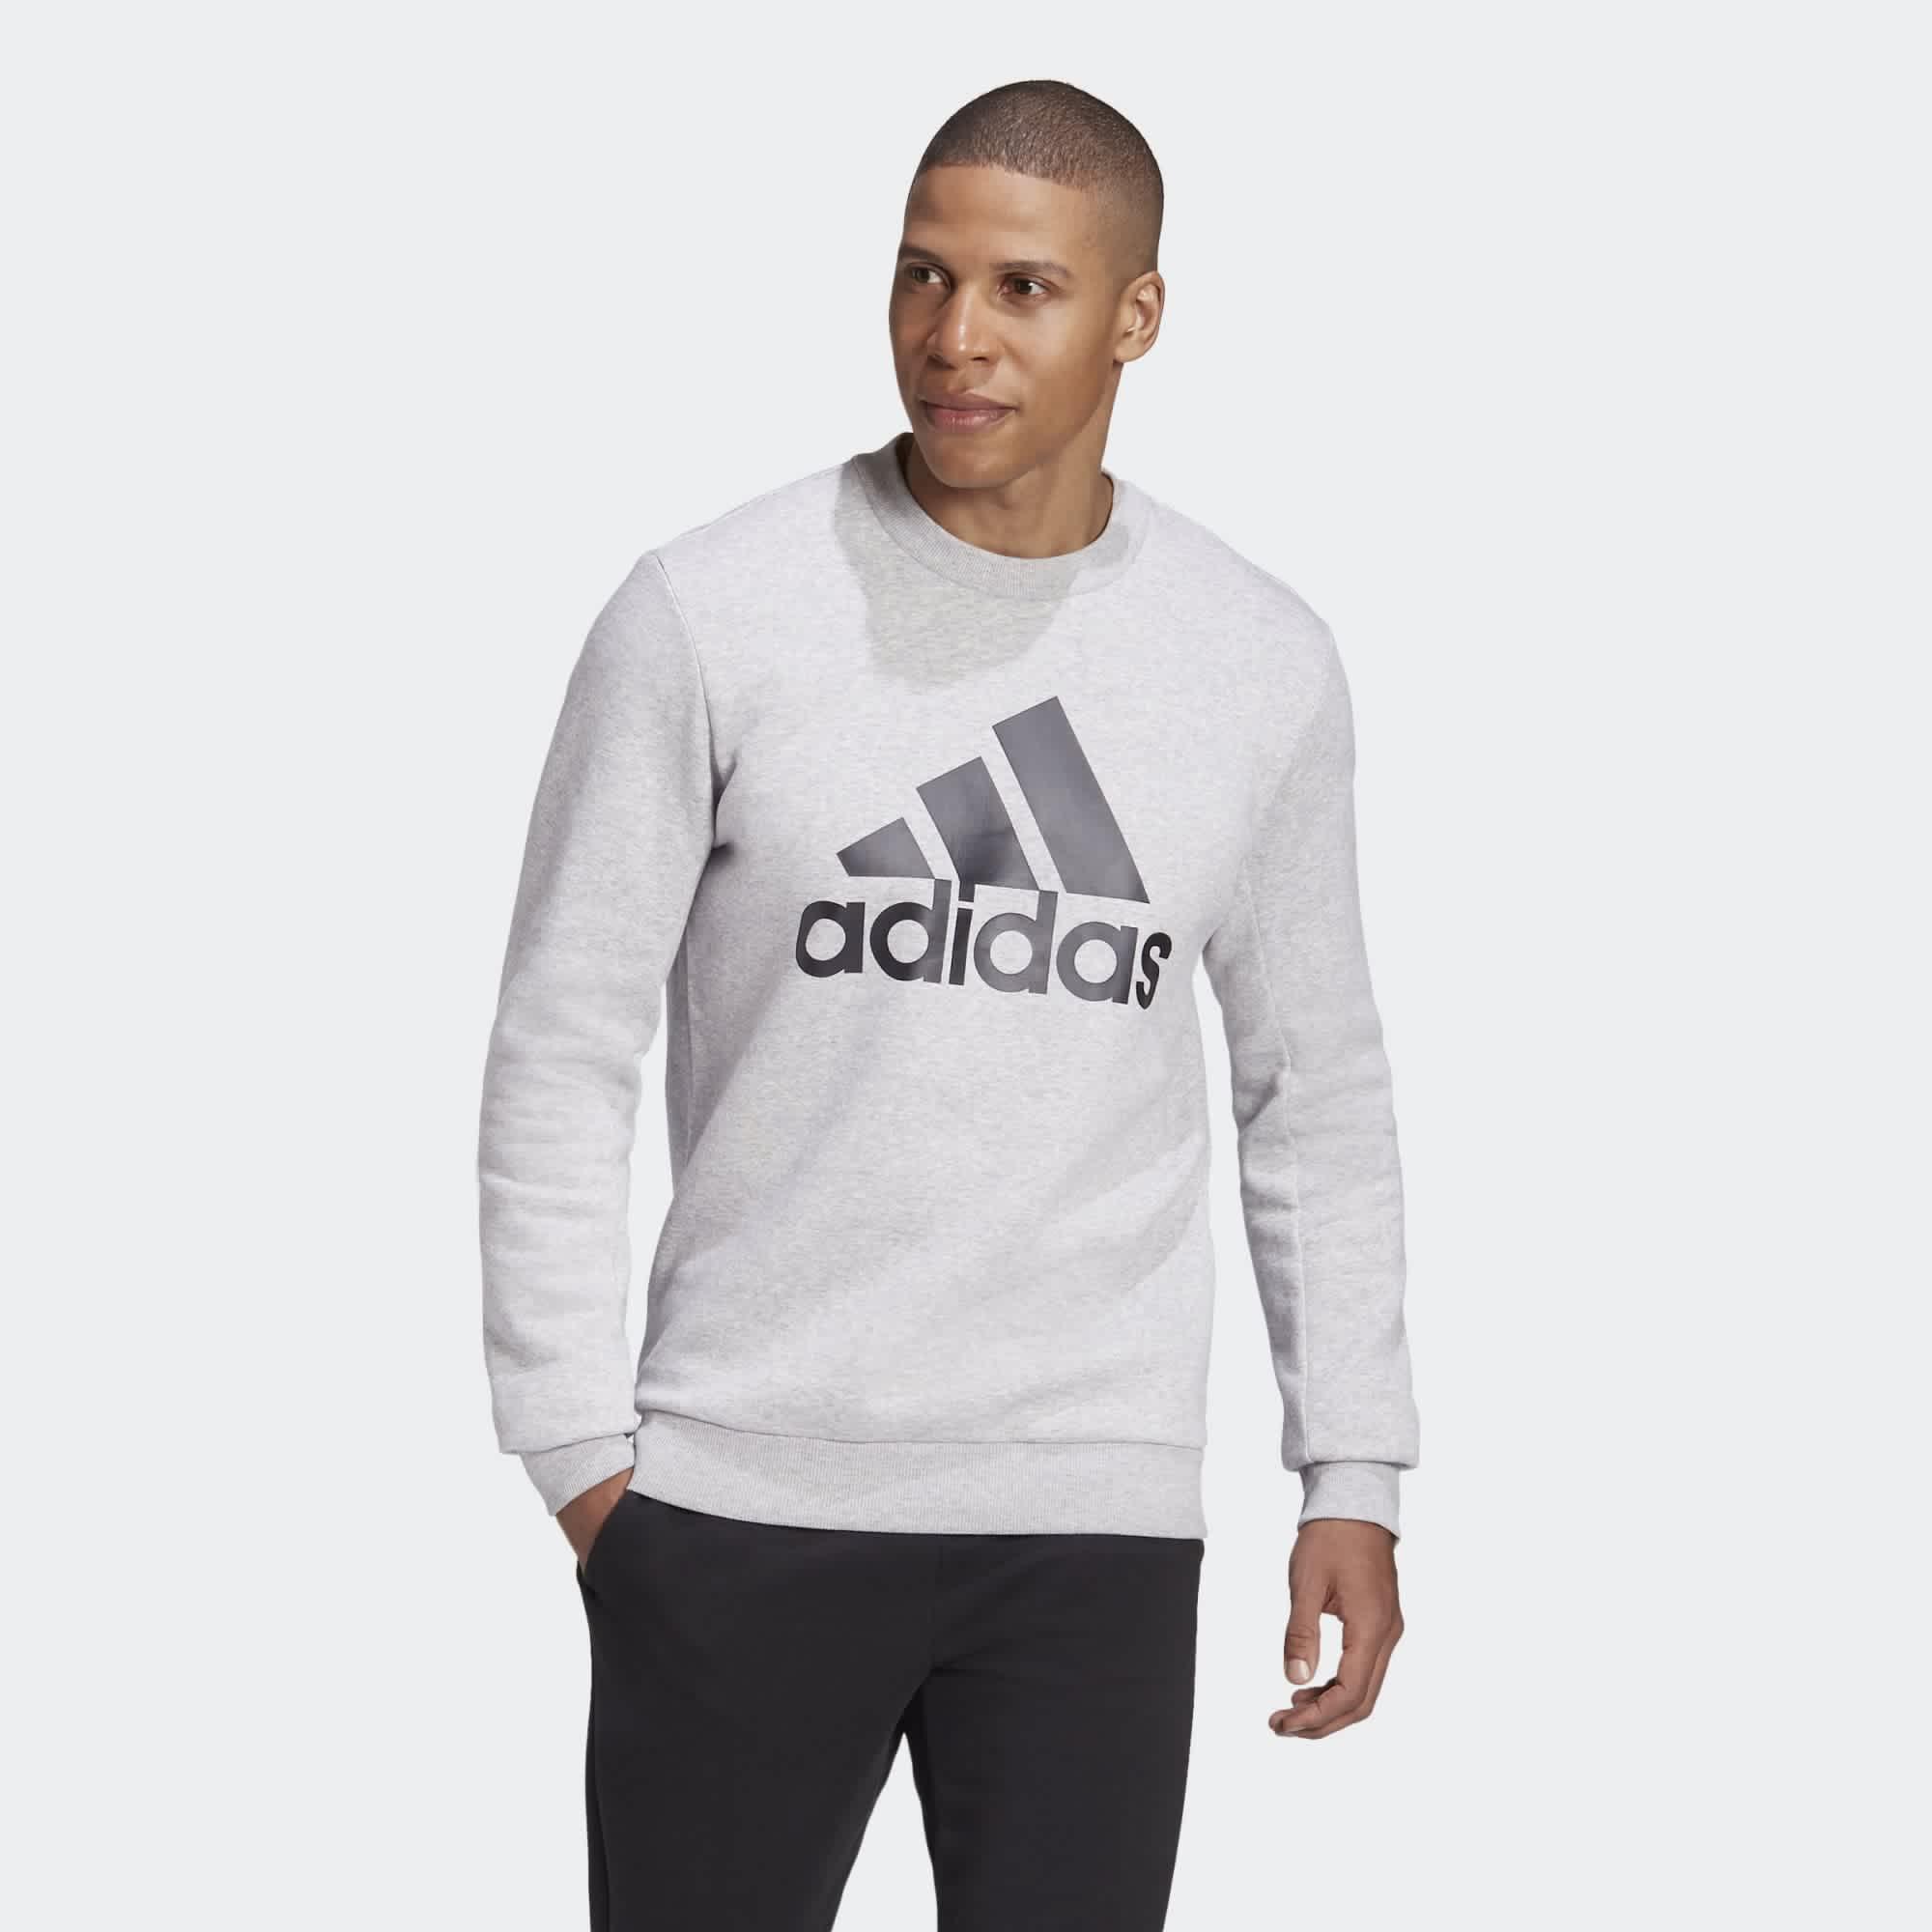 Adidas Black Friday Fleece Sale